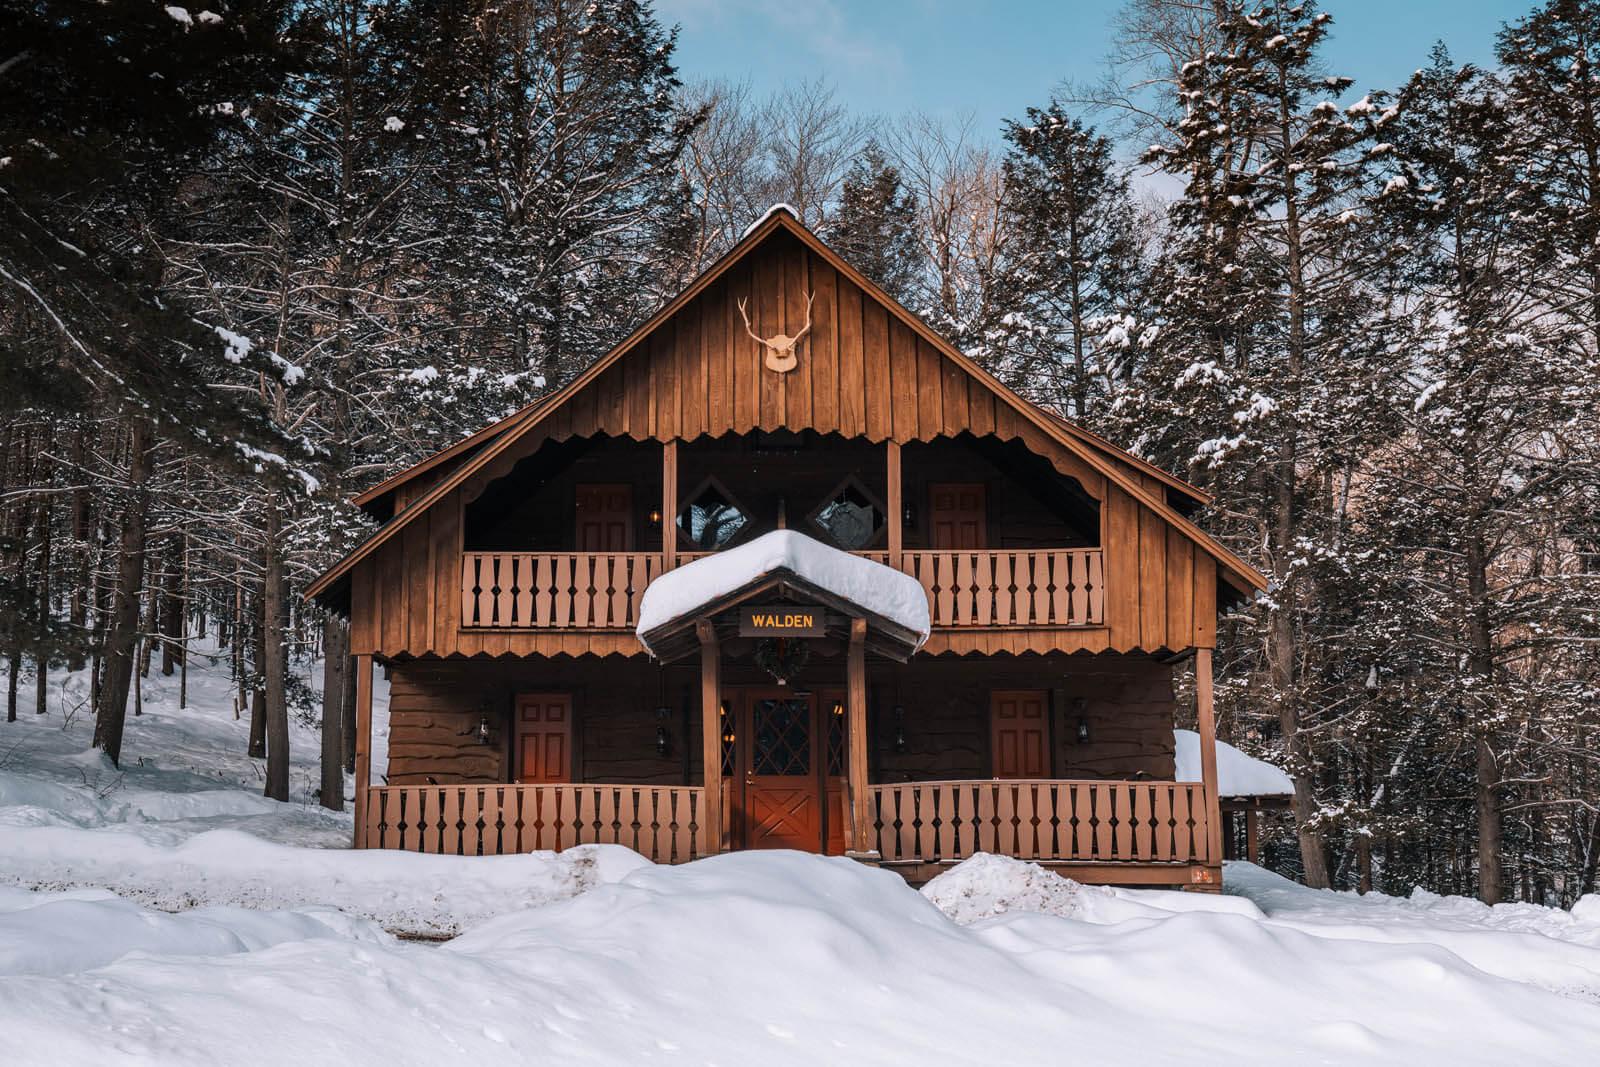 Walden Lodge at Urban Cowboy Catskills in winter in New York